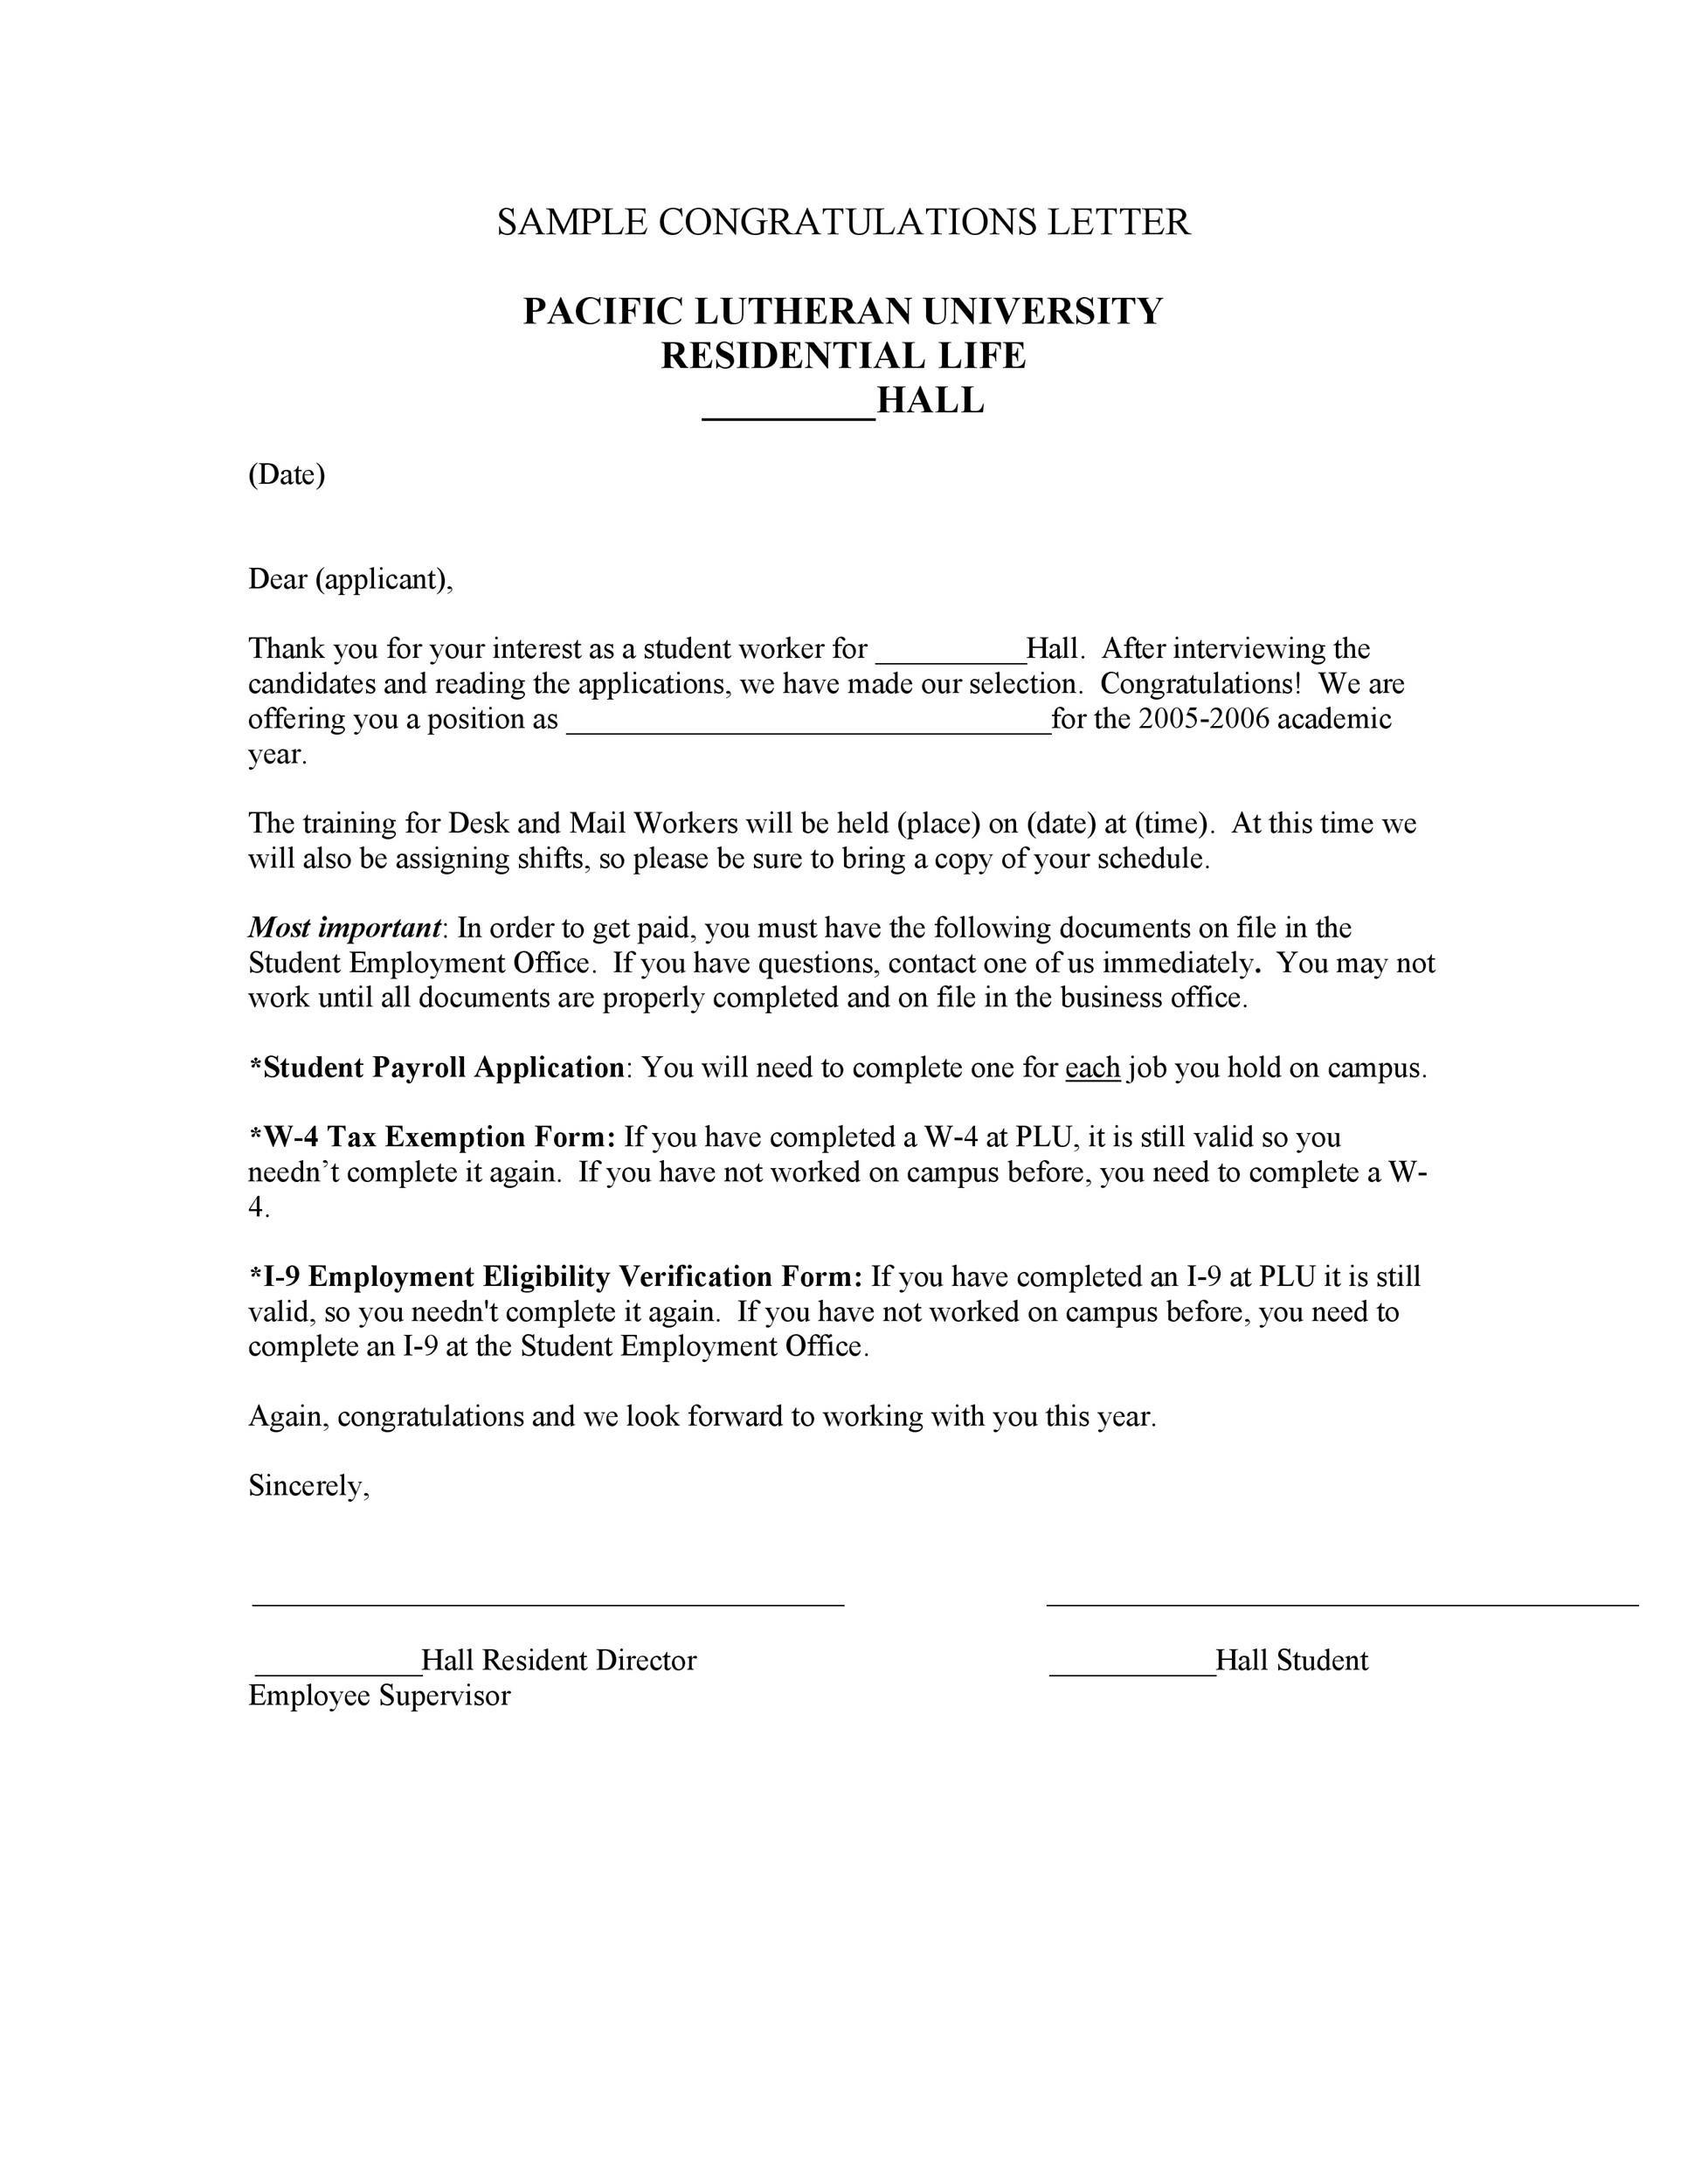 Free congratulations letter 48